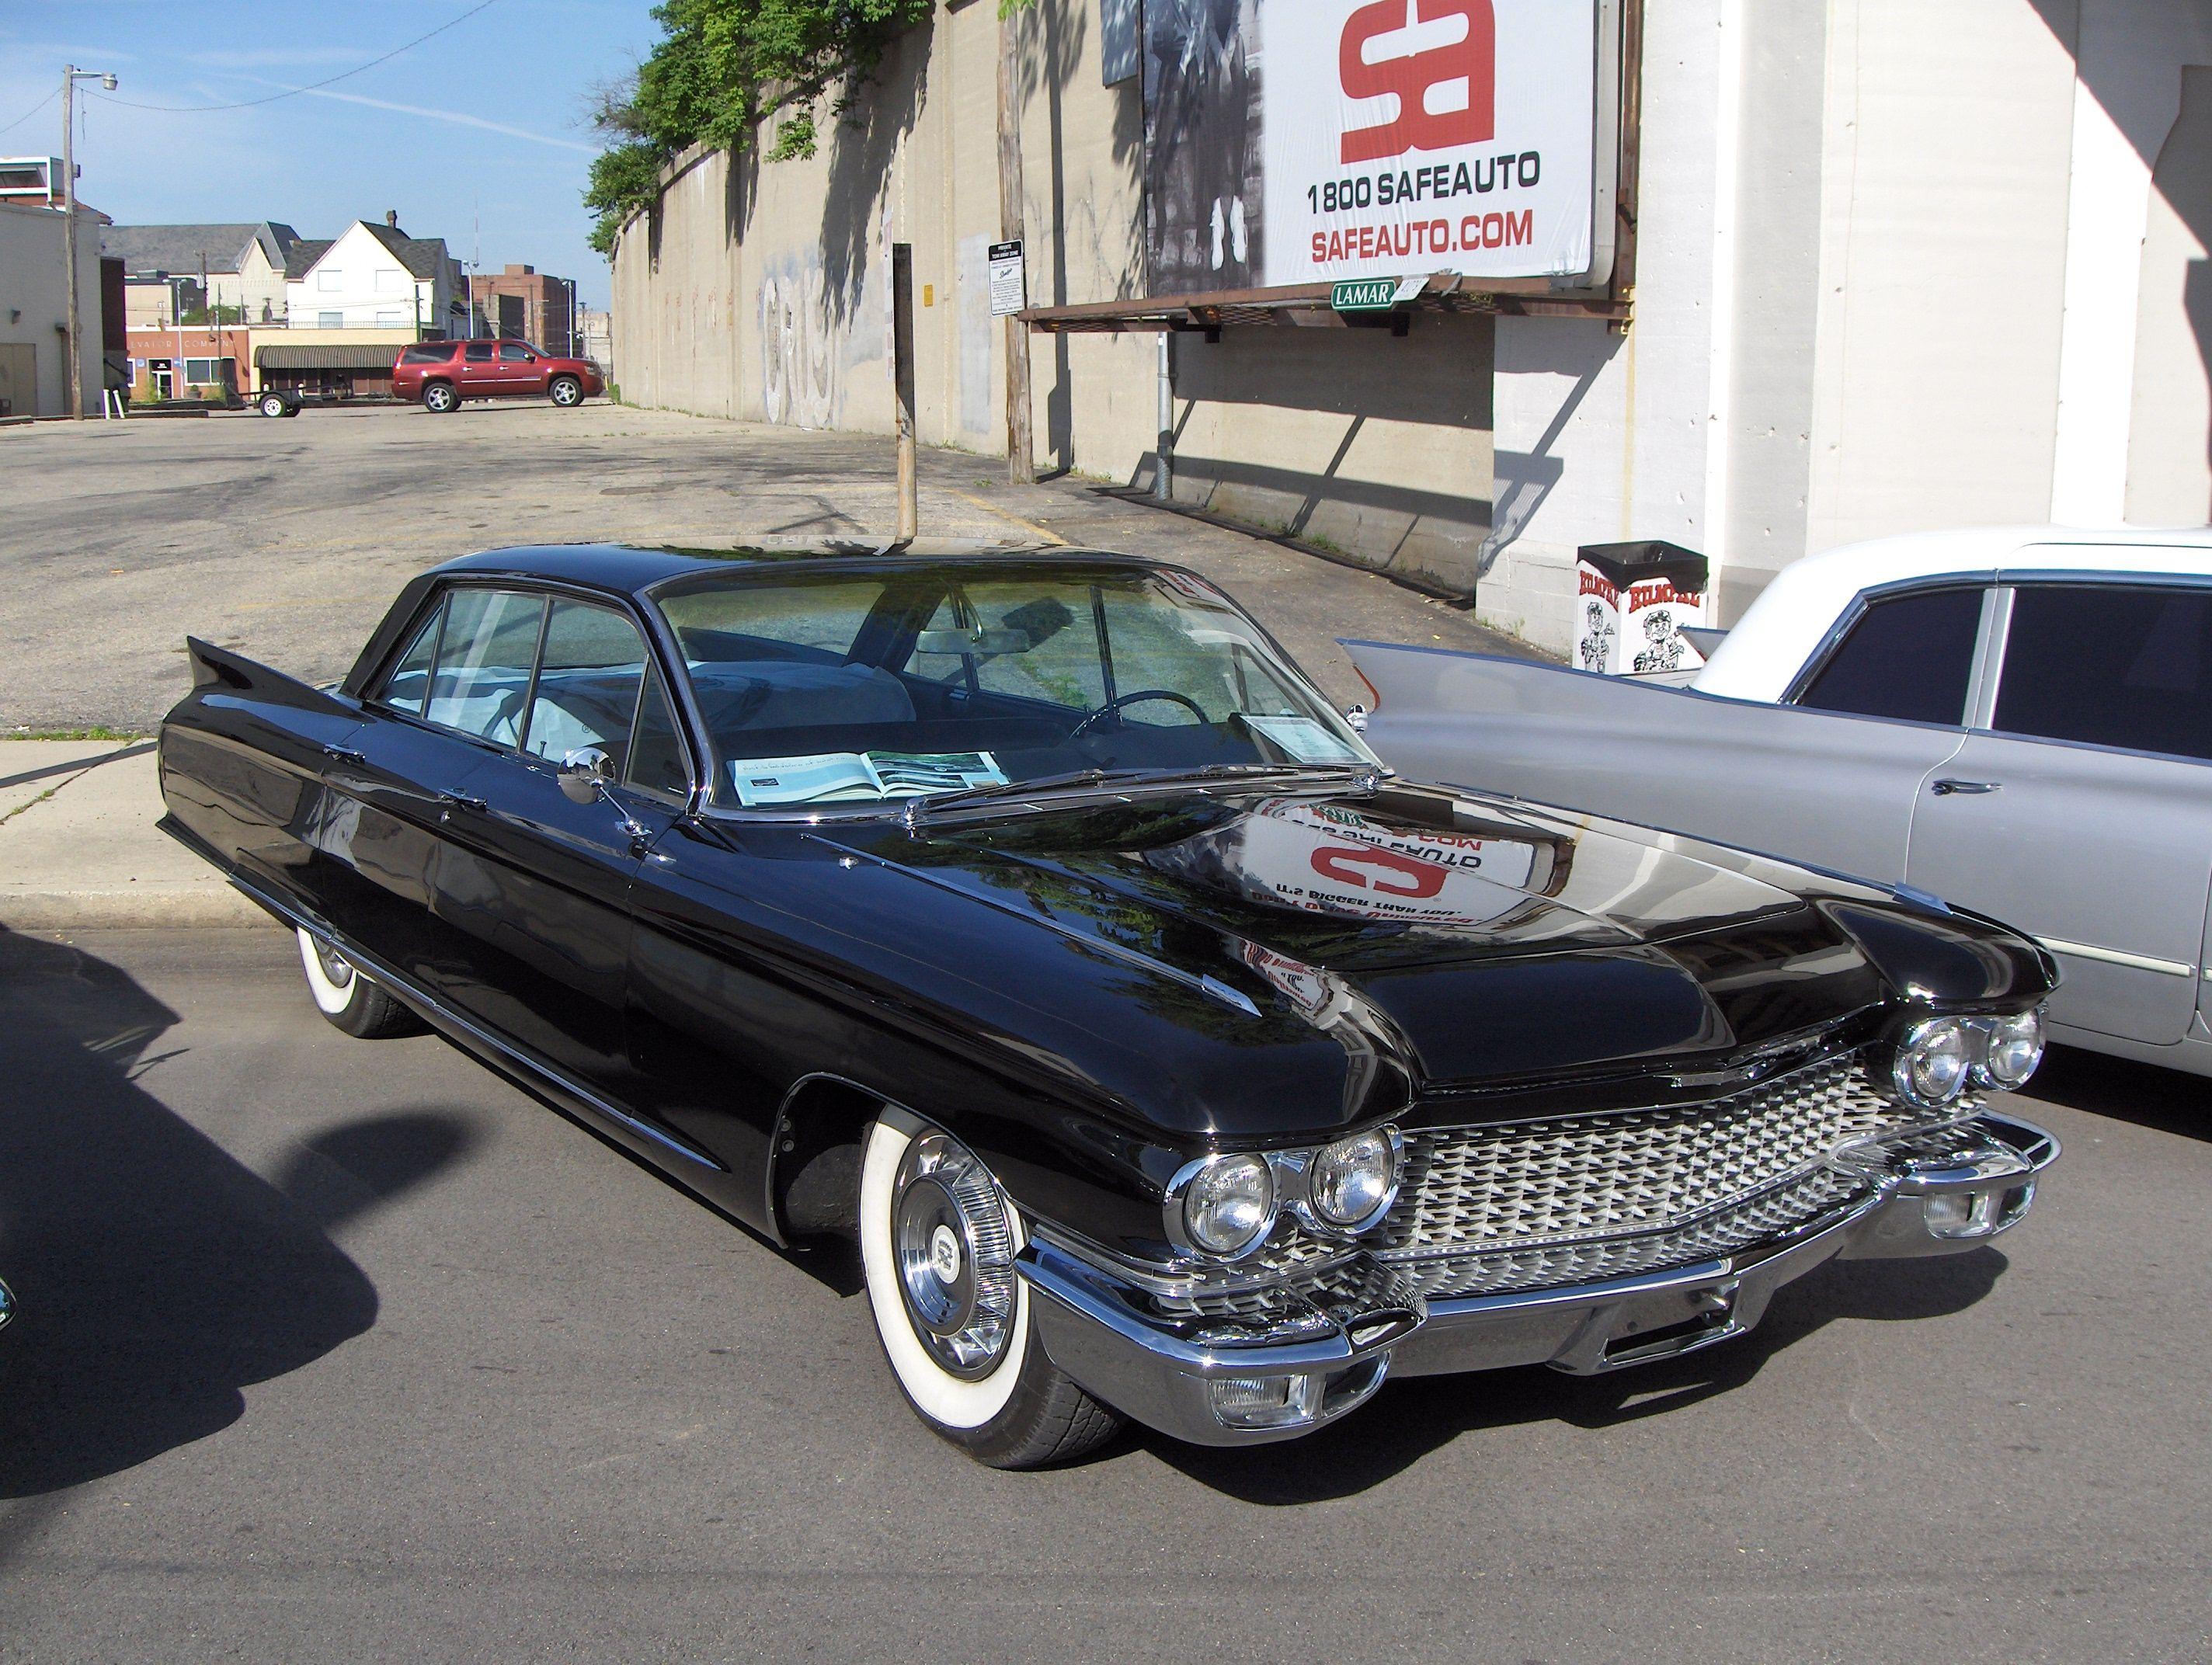 1960 eldorado brougham black black for sale in dayton ohio for 42 900 ohiocadillac